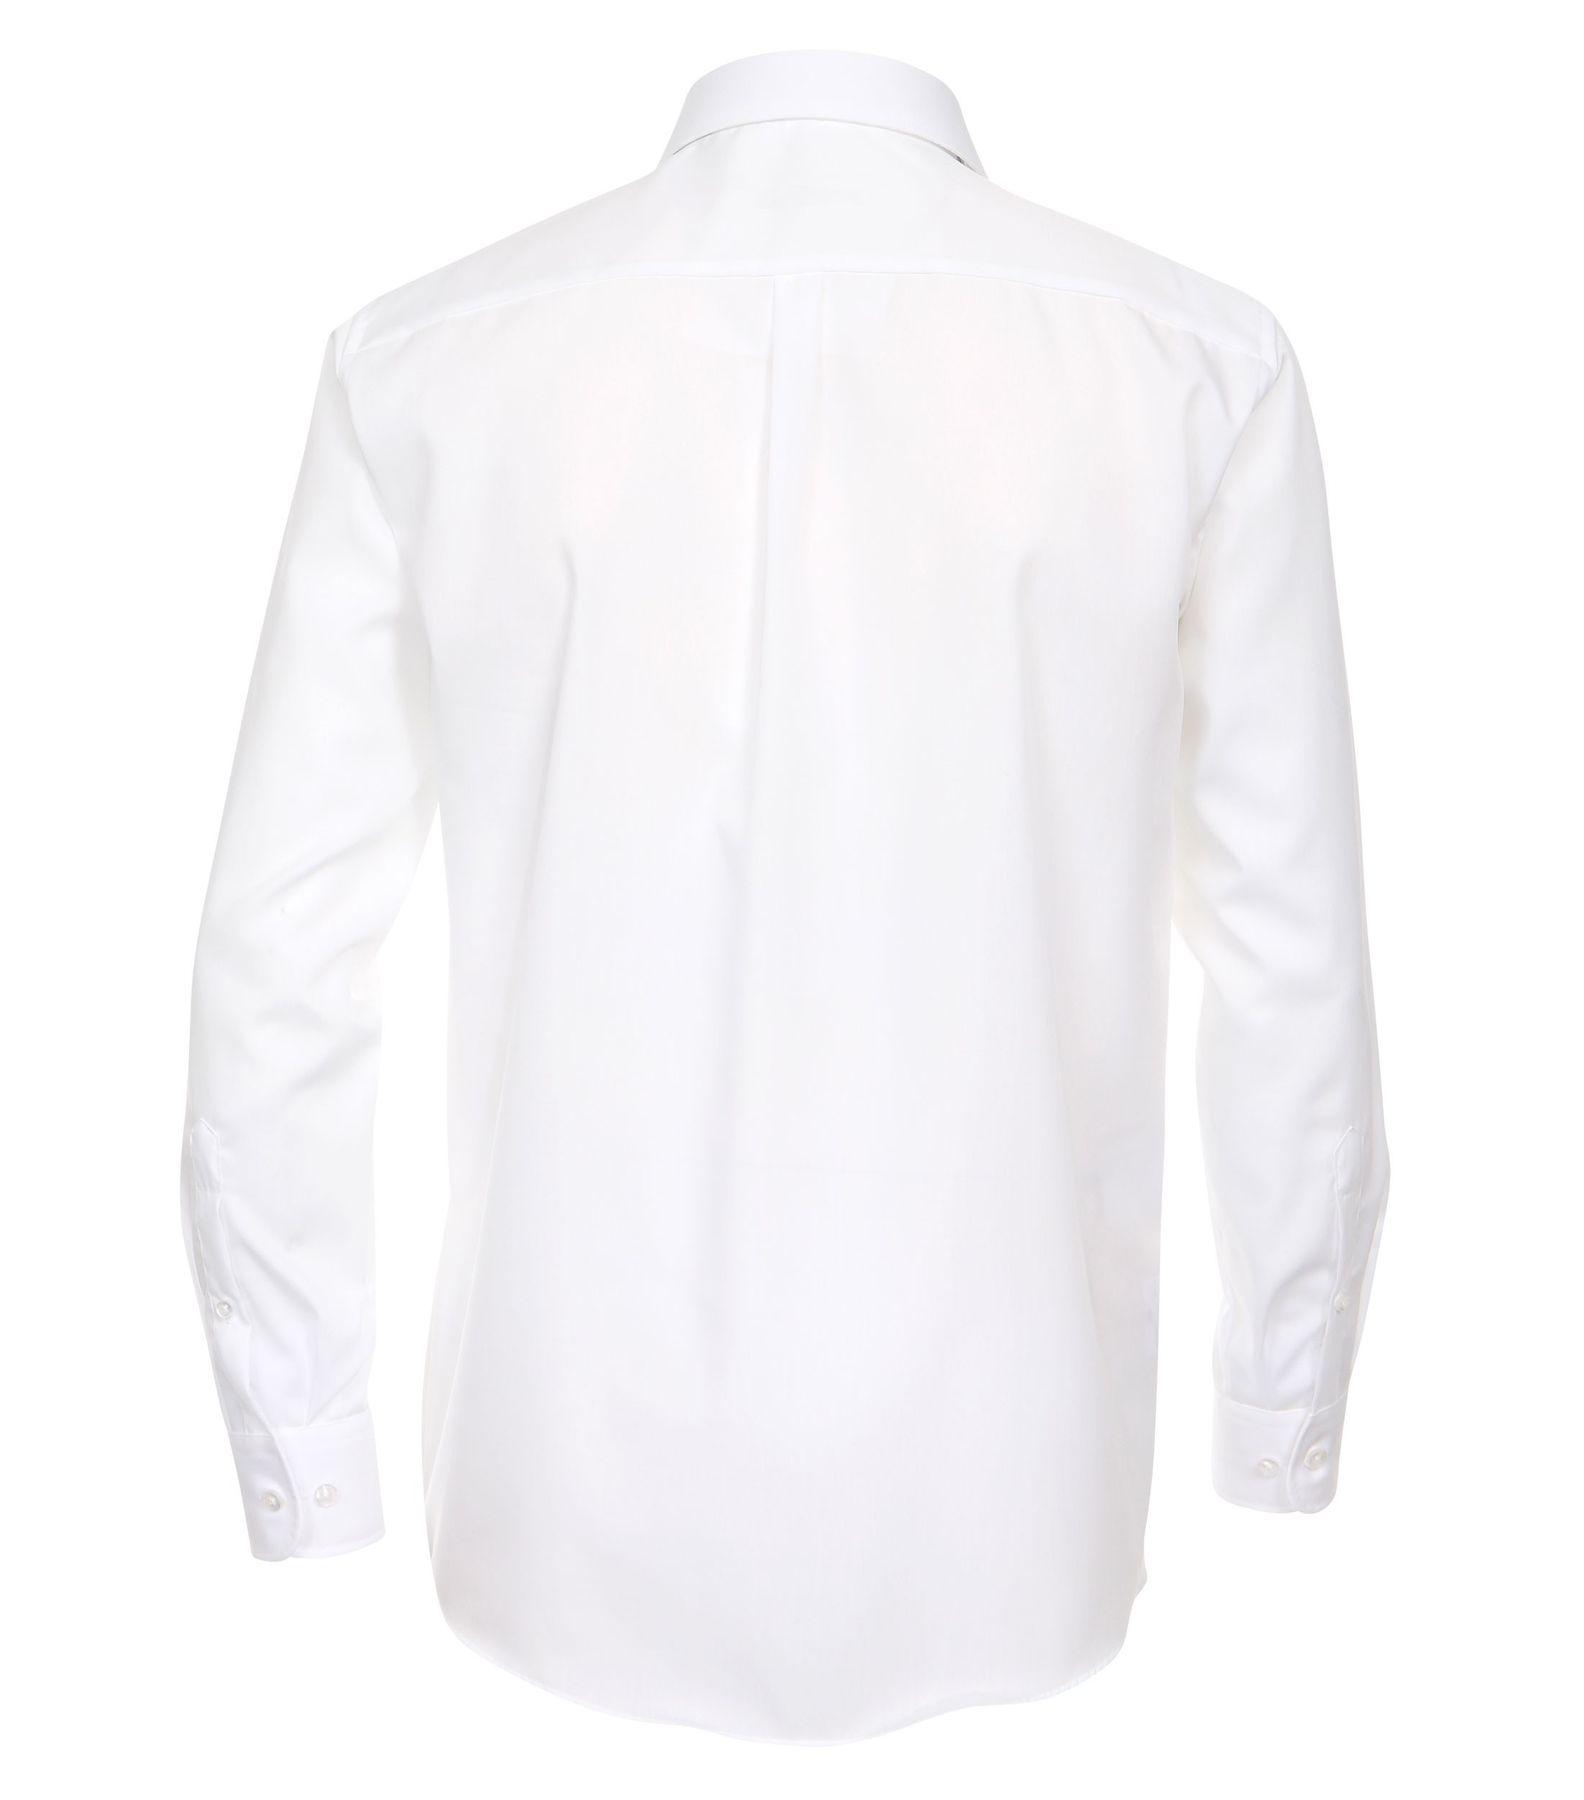 Casa Moda - Comfort Fit - Bügelfreies Herren Business Langarm Hemd verschiedene Farben (006060A) – Bild 10